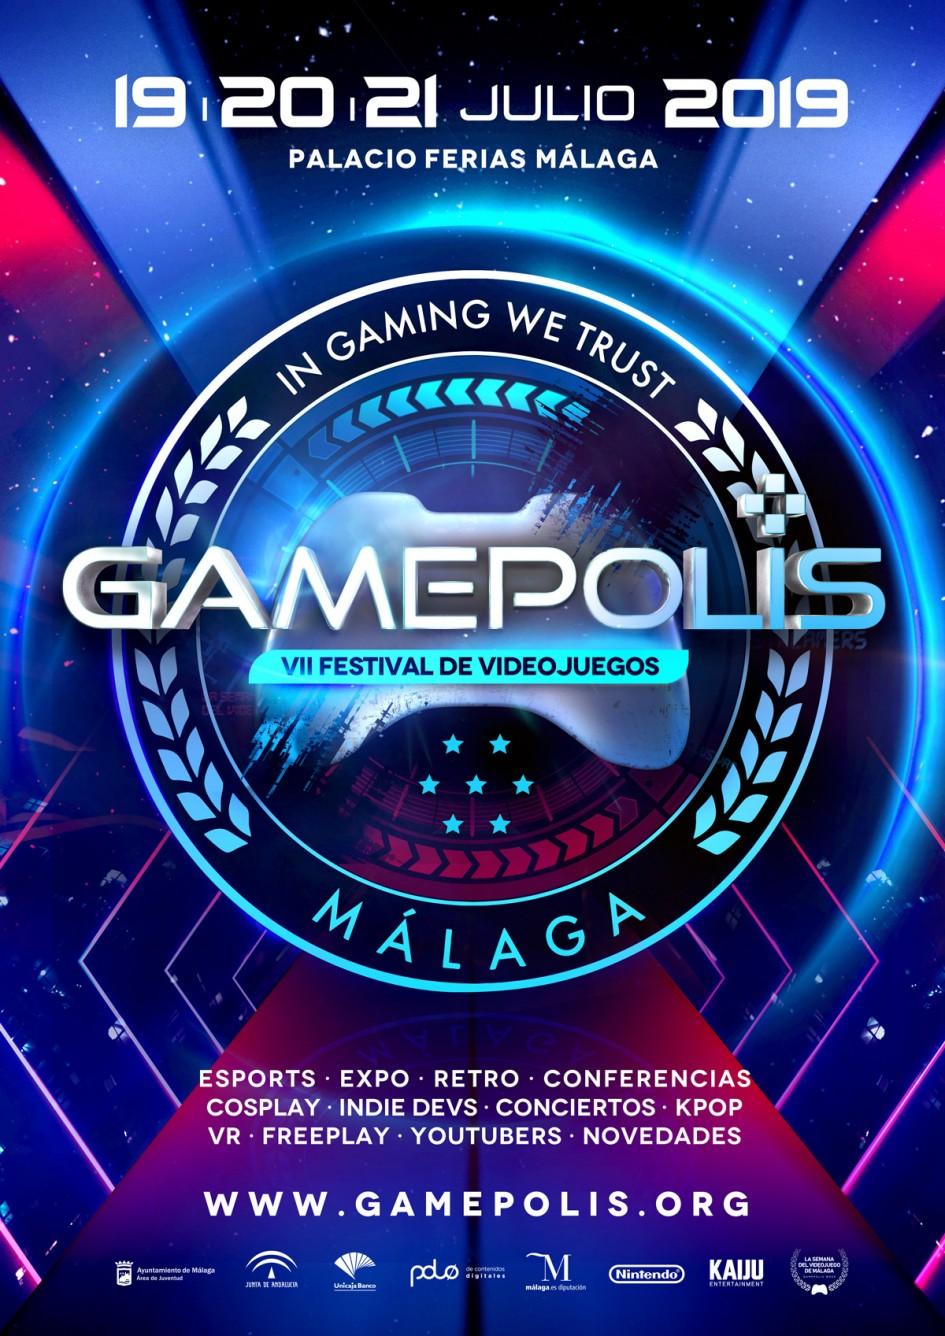 CARTEL-GAMEPOLIS-OFICIAL-2019_redes